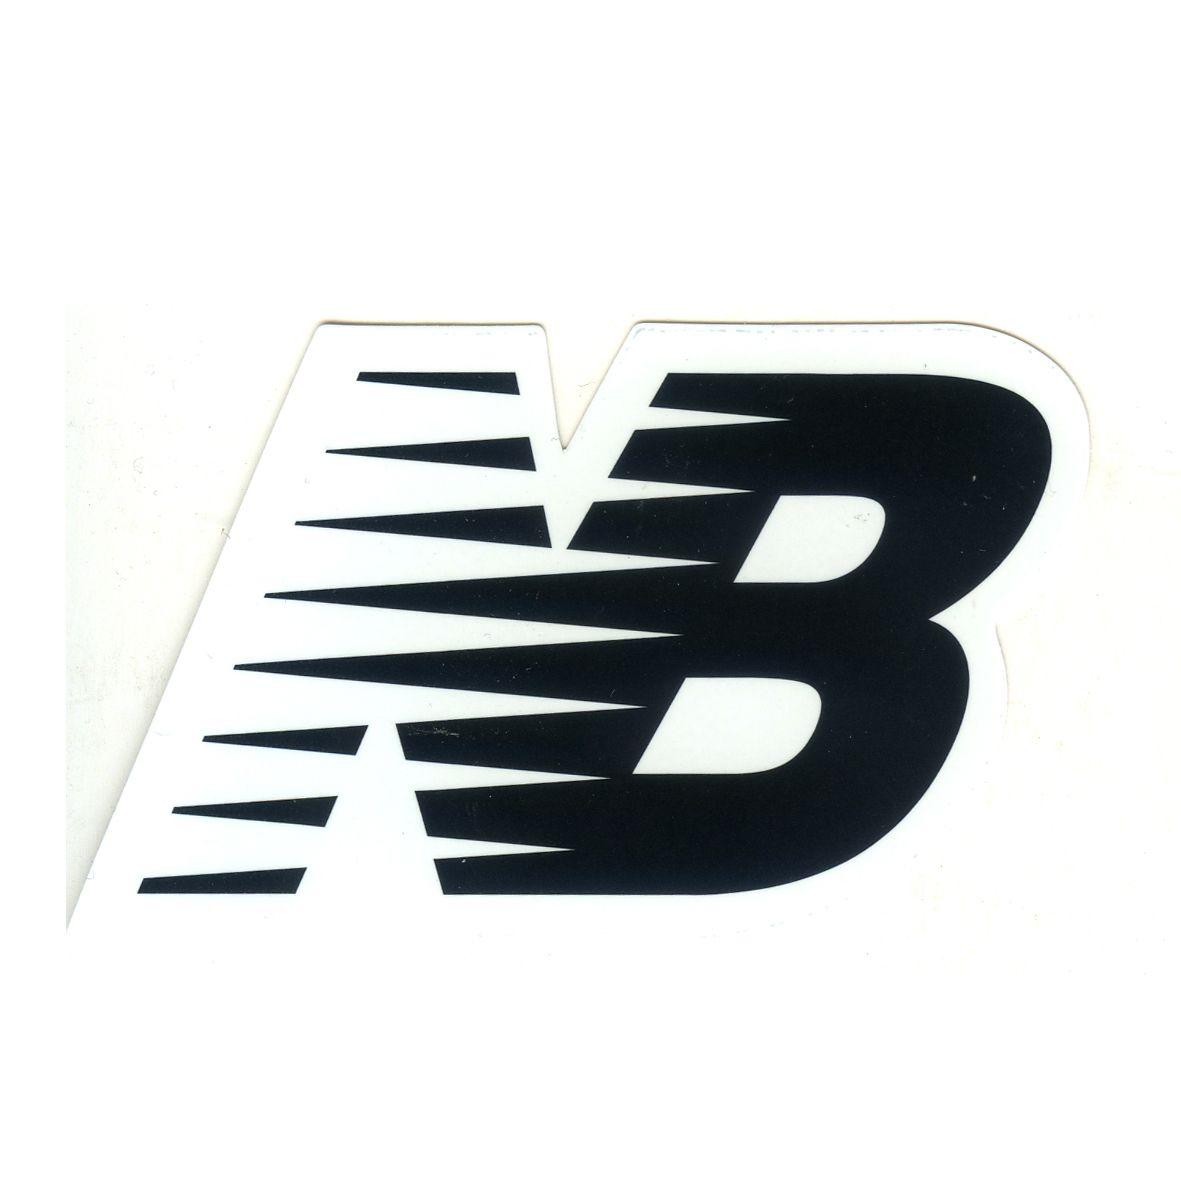 1623 nb new balance shoes logo width 9 cm decal sticker